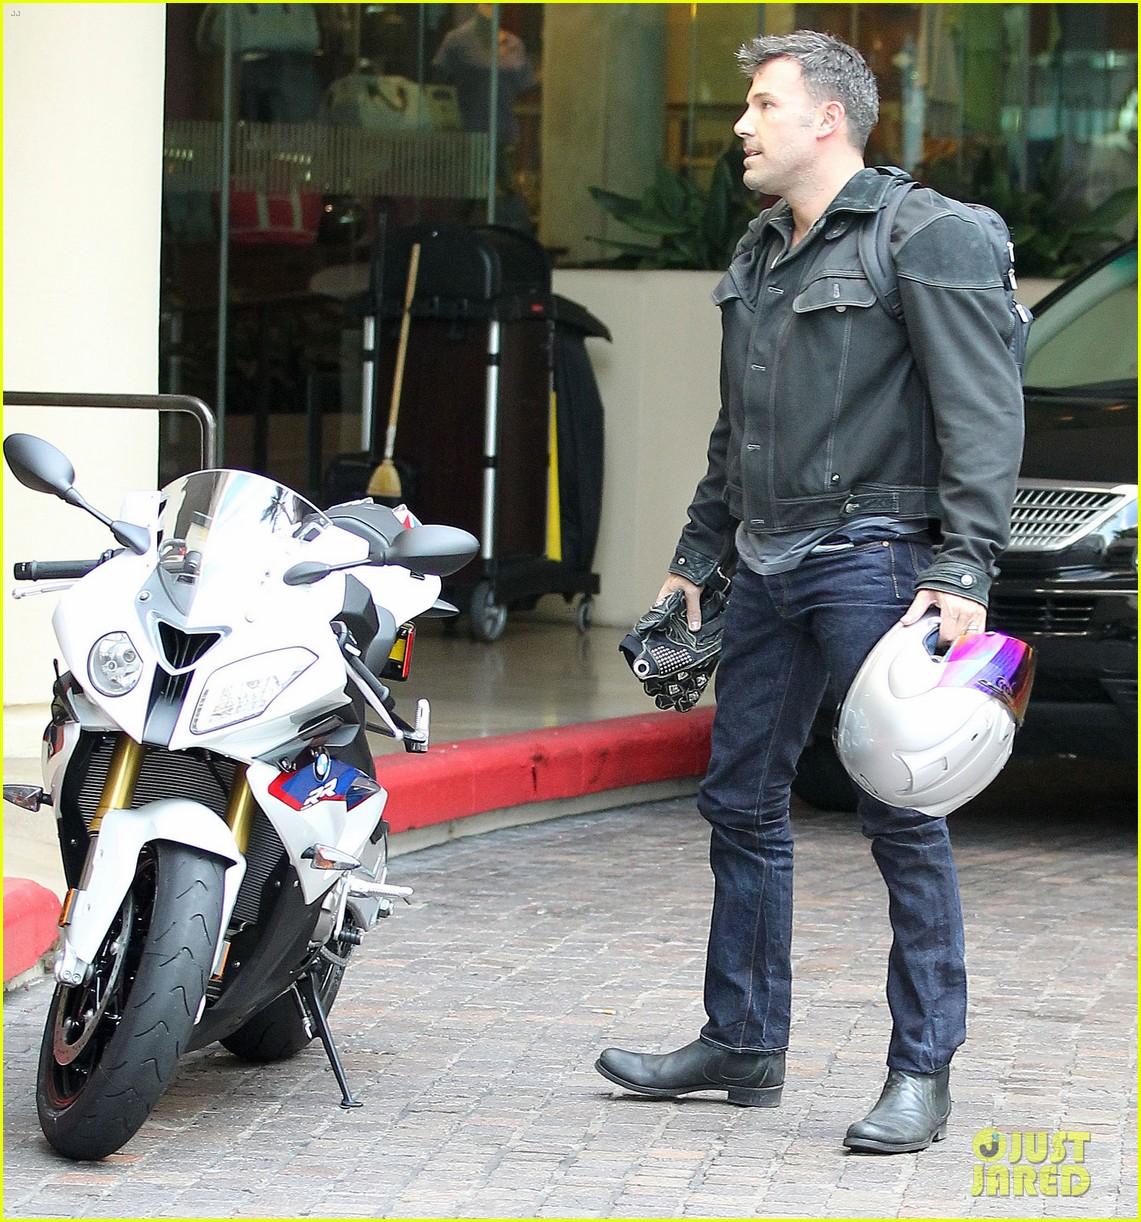 jennifer garner spends time with the girls ben affleck rides motorcycle 062731285